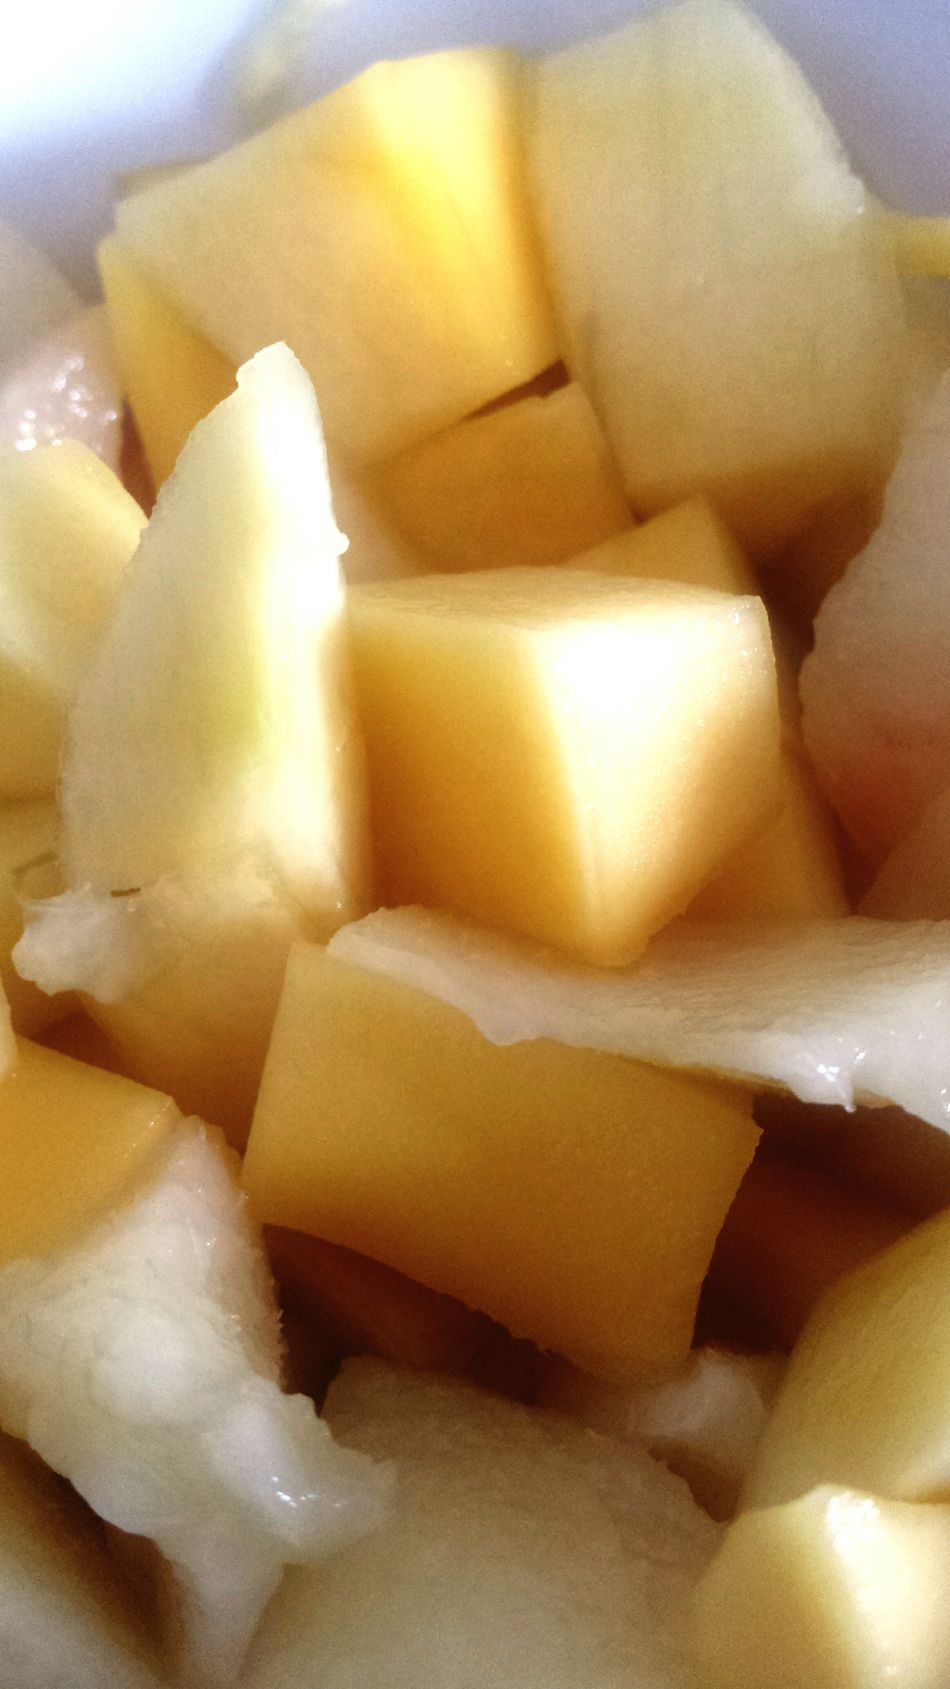 Goûter 😉 Mangue  Nectarine Fruits Fruitsalad Tropical Fruits Summer Fruits Fruits Lover Fruitsnacks Fresh Fruits Fruits And Vegetables